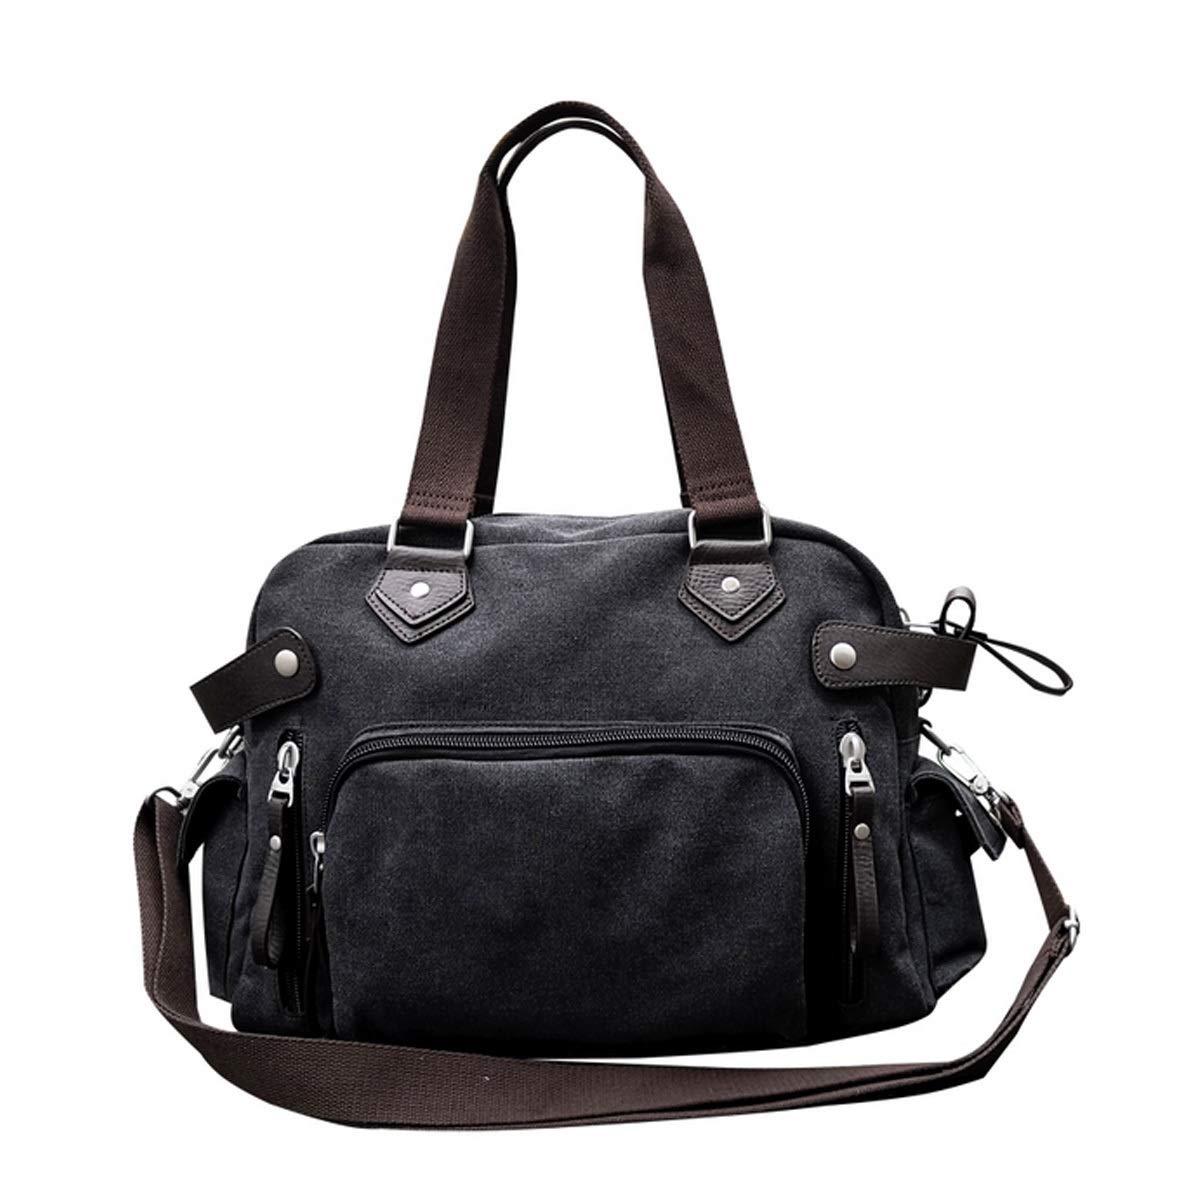 MINRUIGONGMAO Boston Mall Shoulder Bag Duffel 16 Ranking TOP4 Handbag Canvas